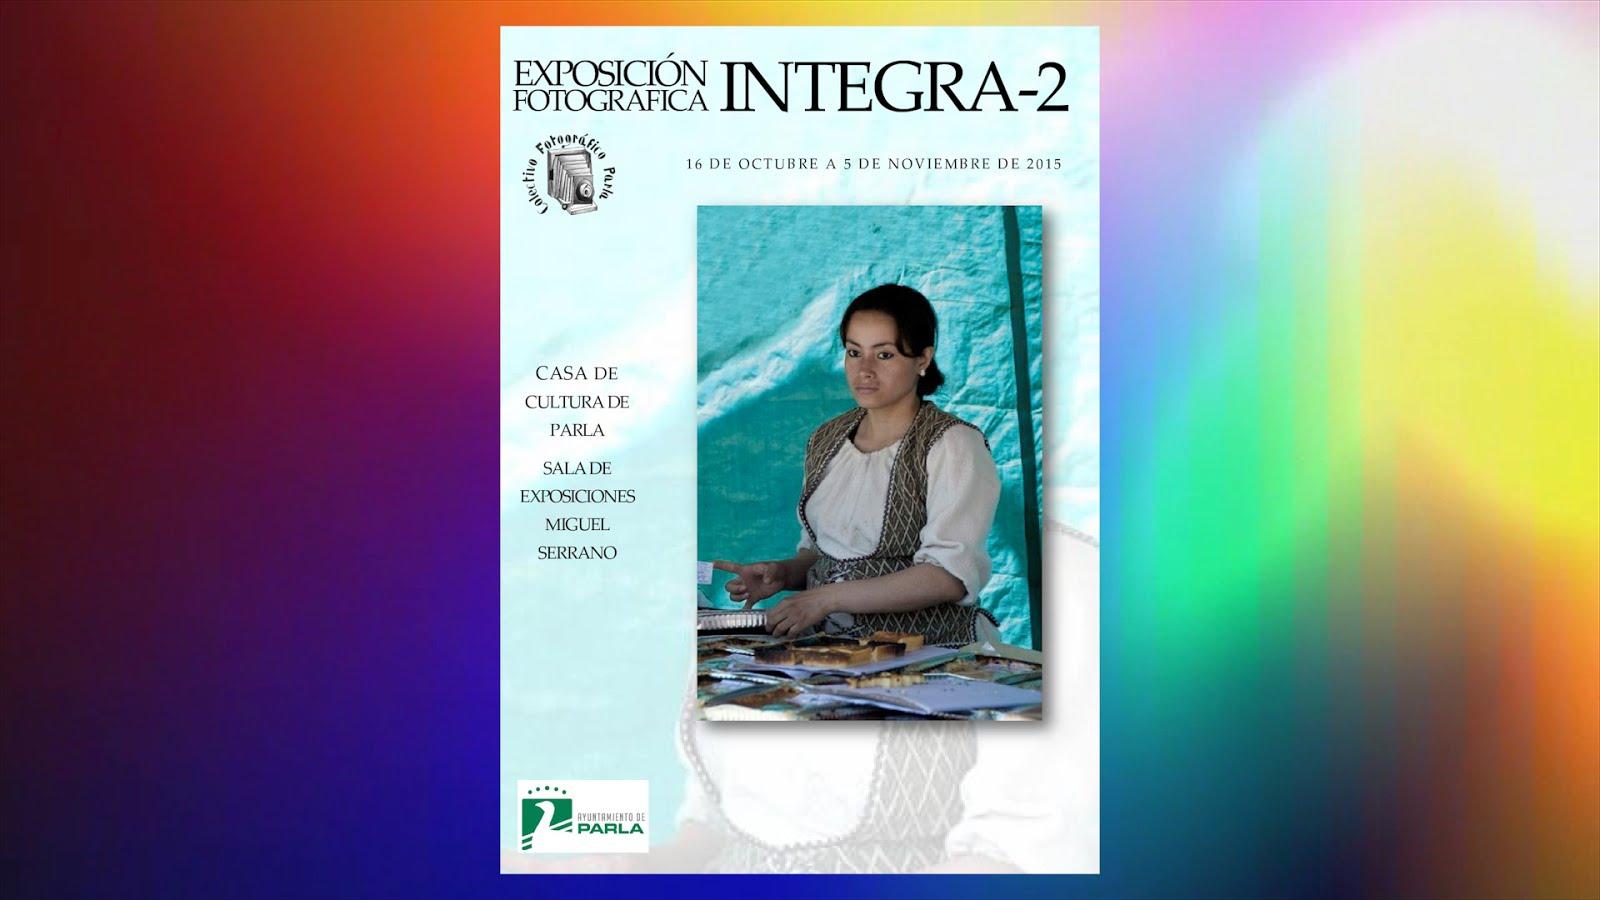 INTEGRA - 2